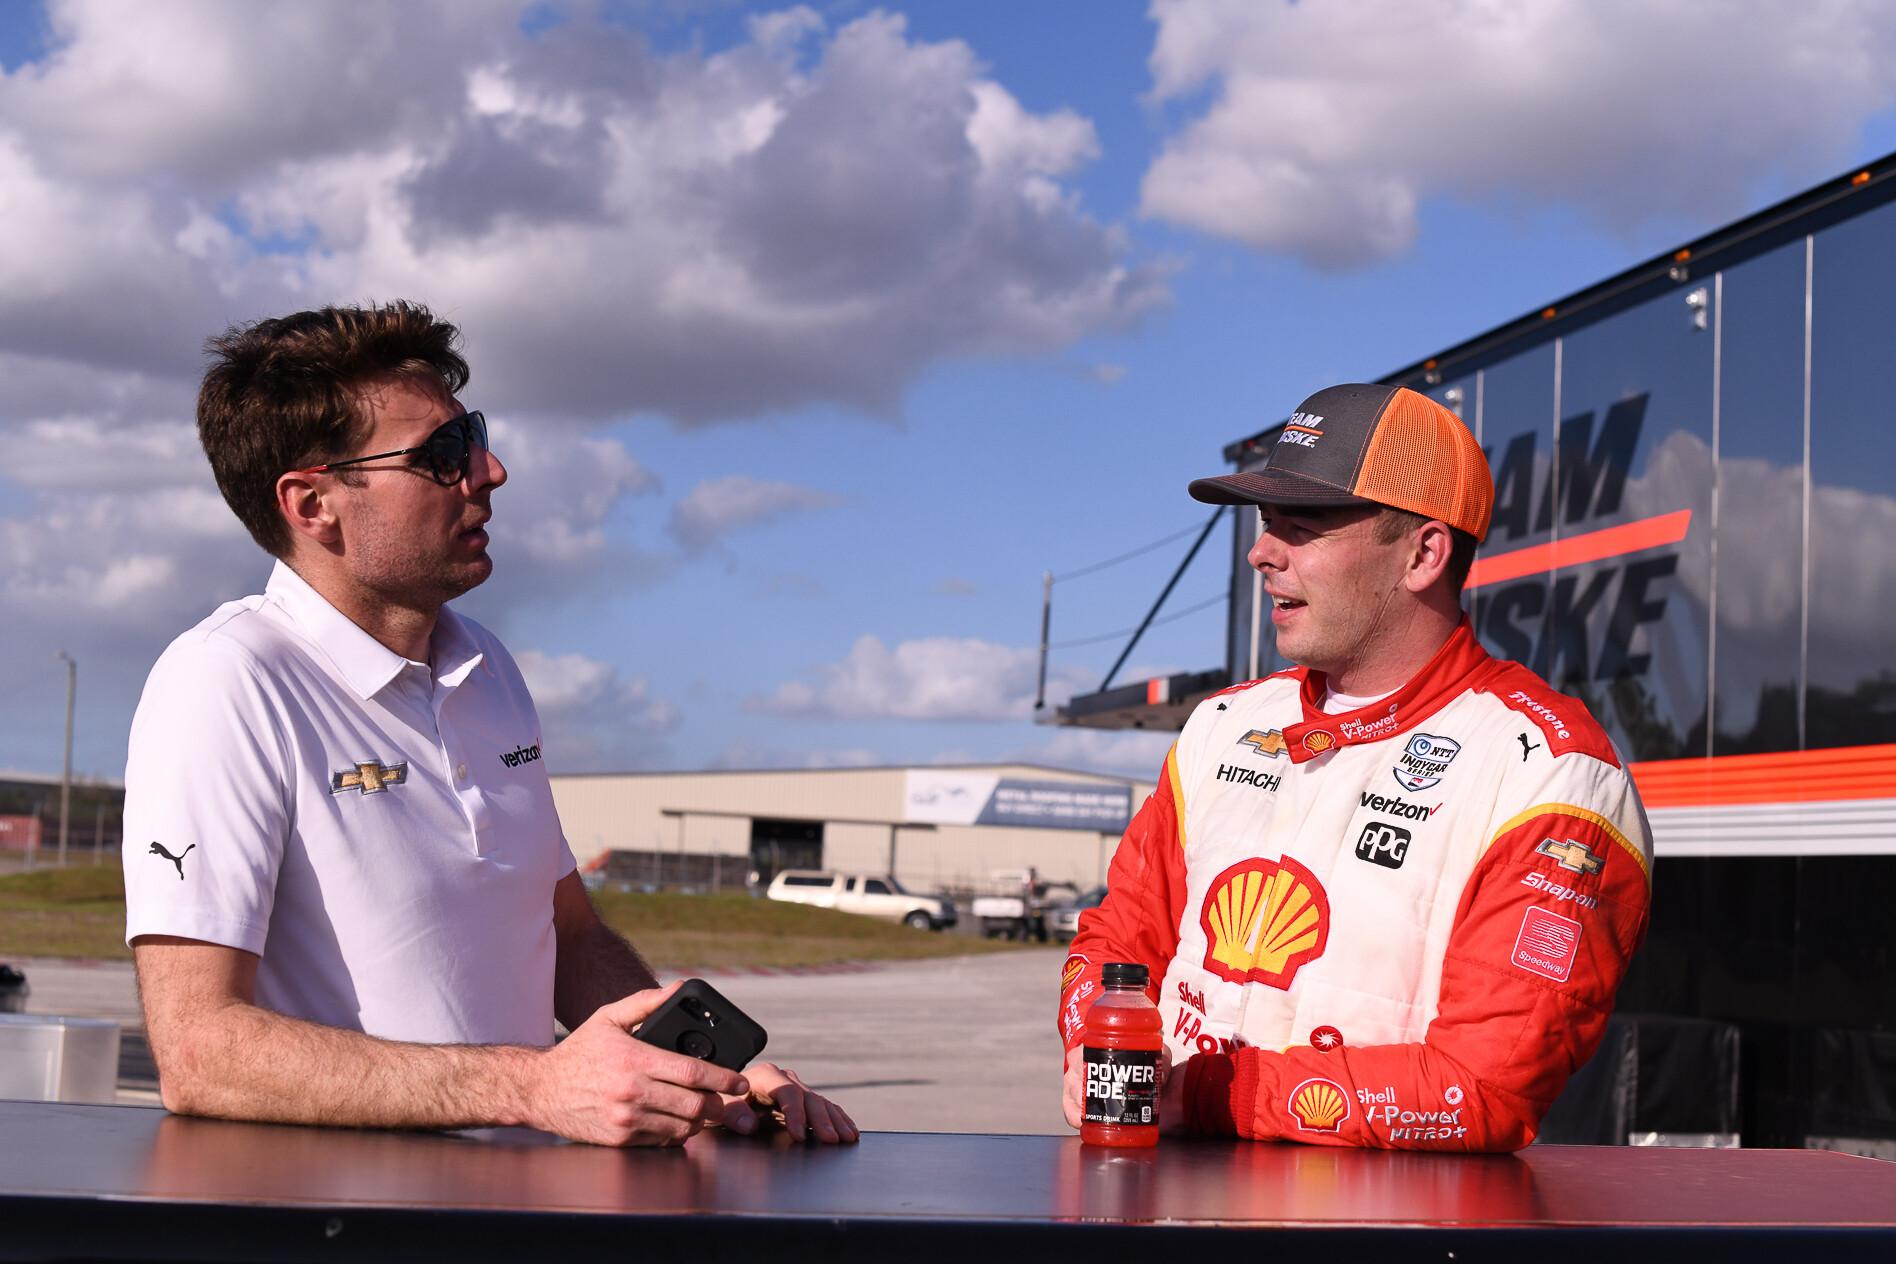 Scott Mc Laughlin Indycar Test 288 Of 10 29 Jpg